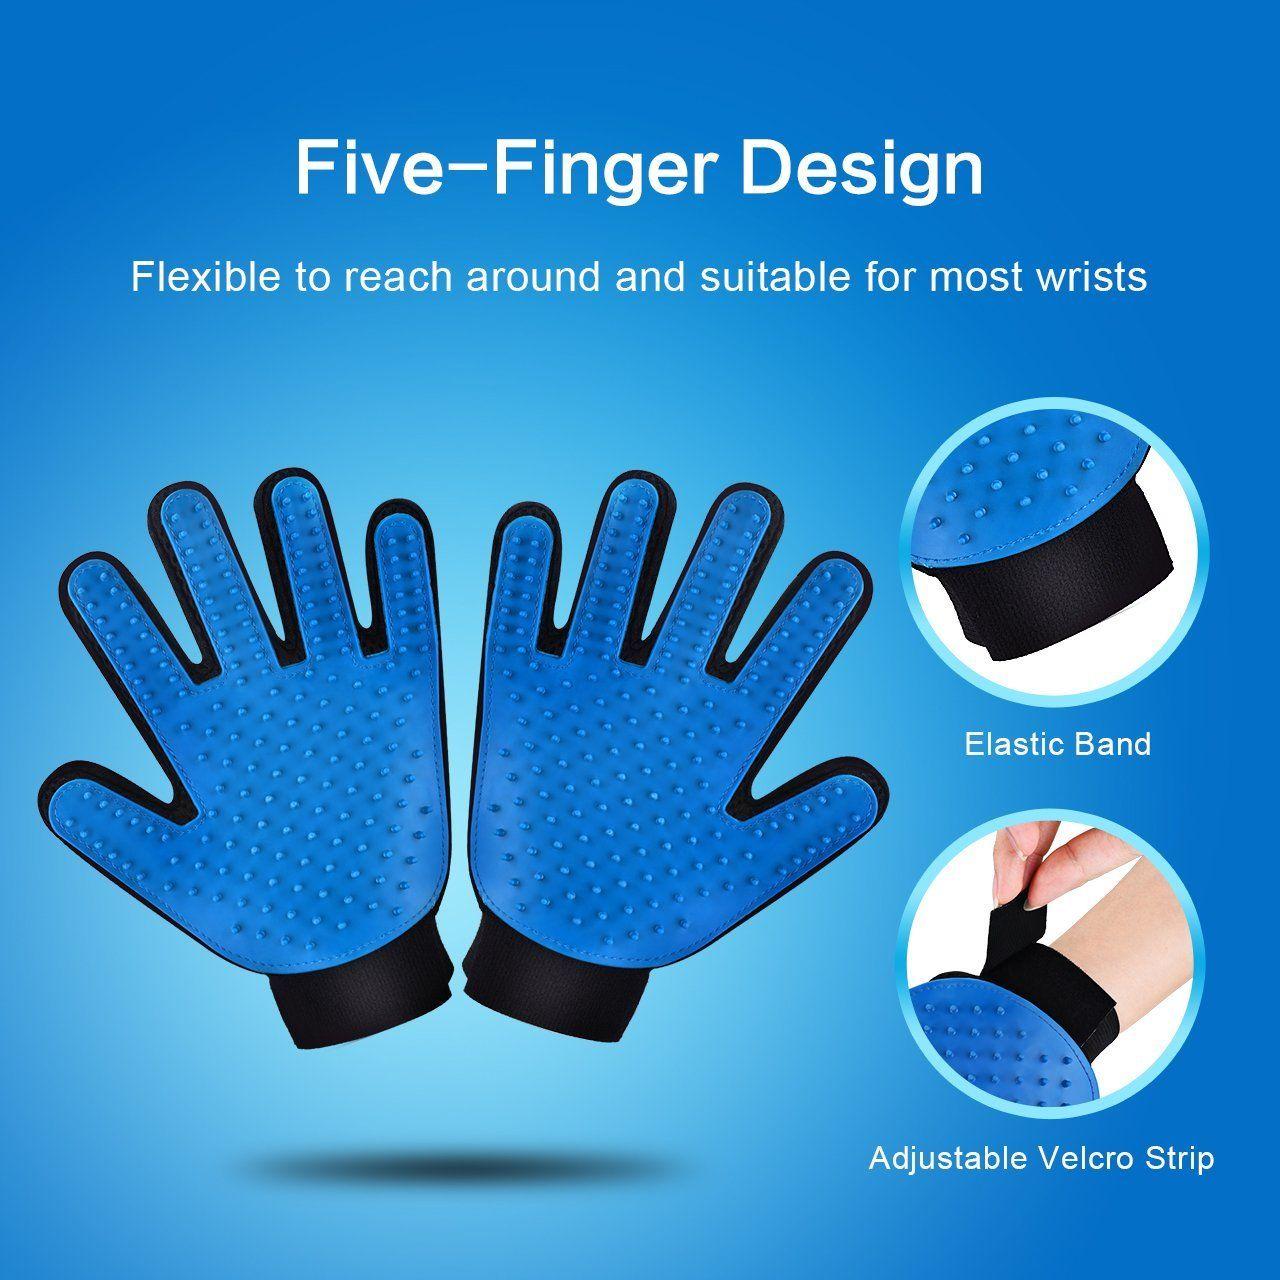 Pet Grooming Glove Gentle De-shedding Brush Glove Efficient Pet Hair Remover Mitt Massage Tool with Enhanced Five Finger Design Right hand